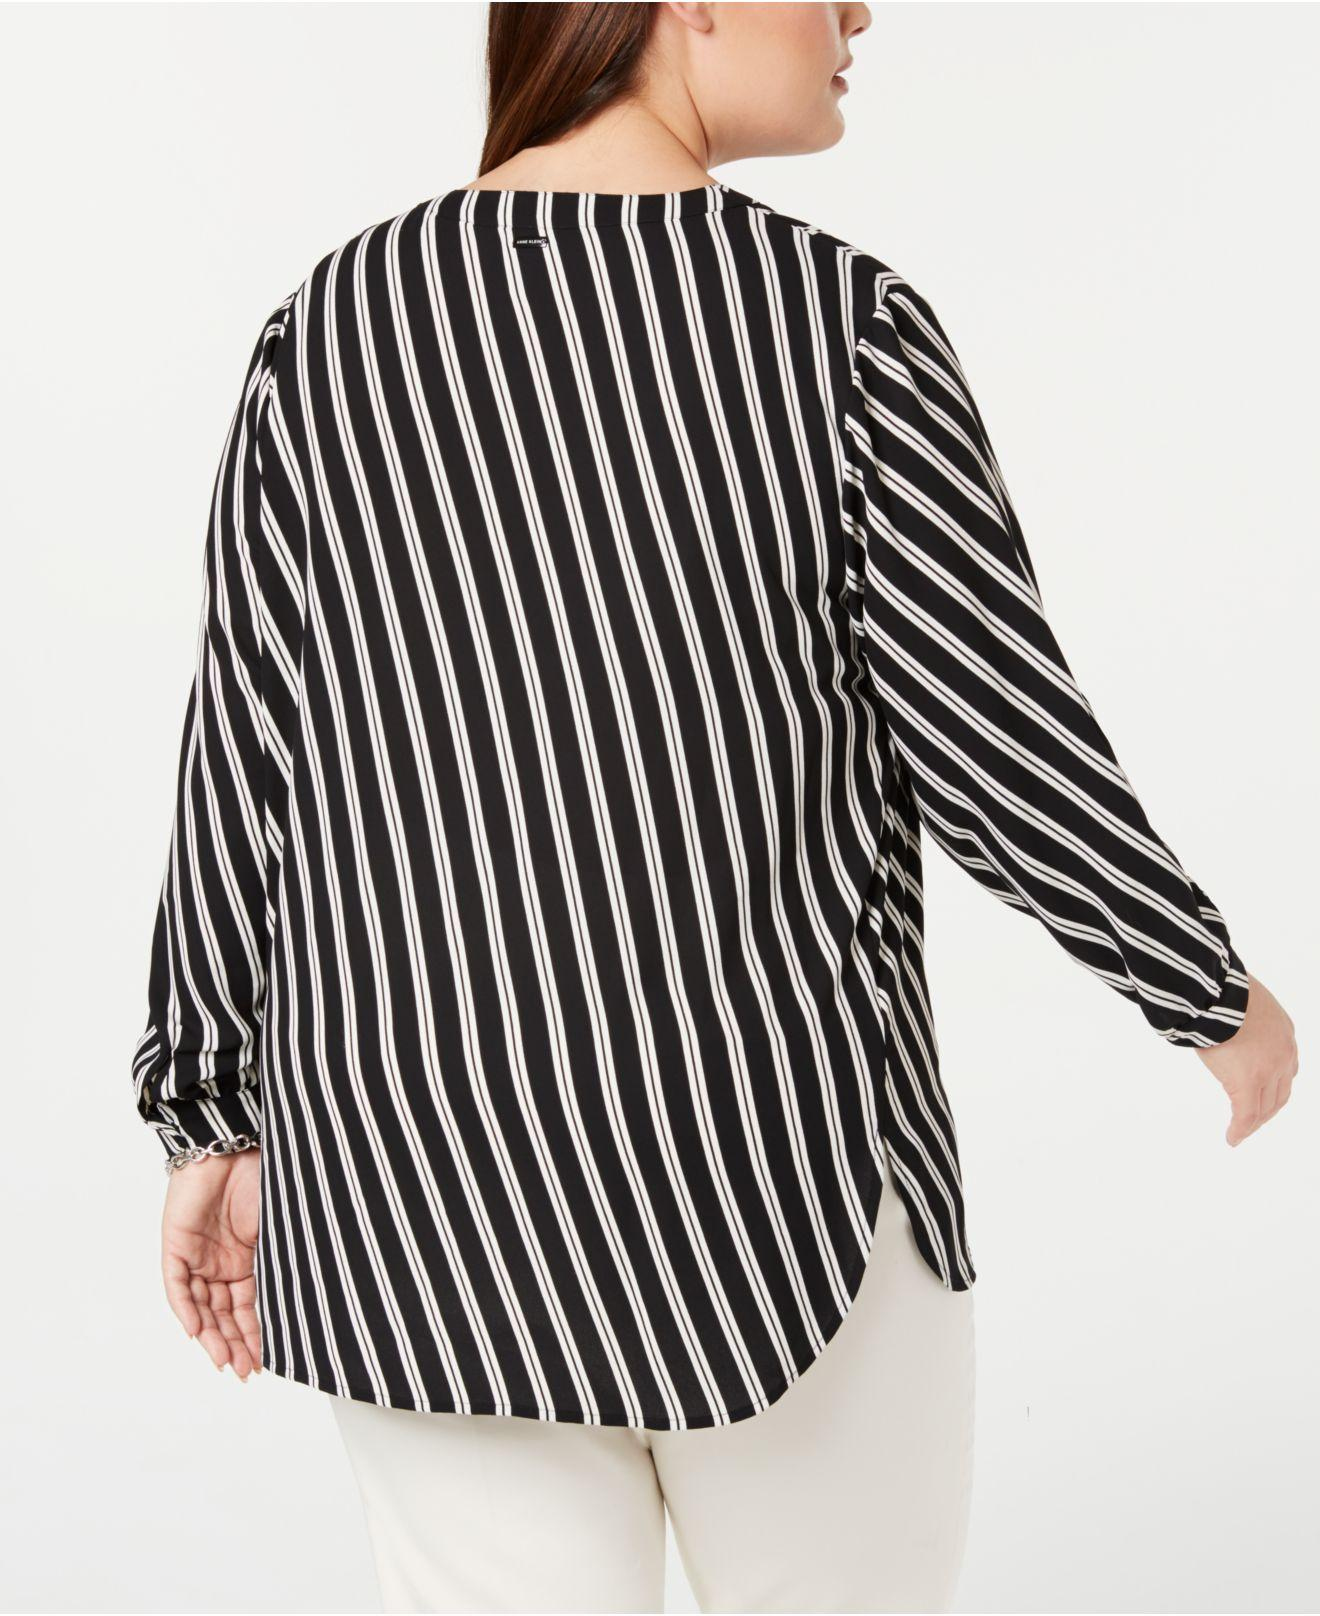 59b1d3d3b36 Lyst - Anne Klein Plus Size Striped Top in Black